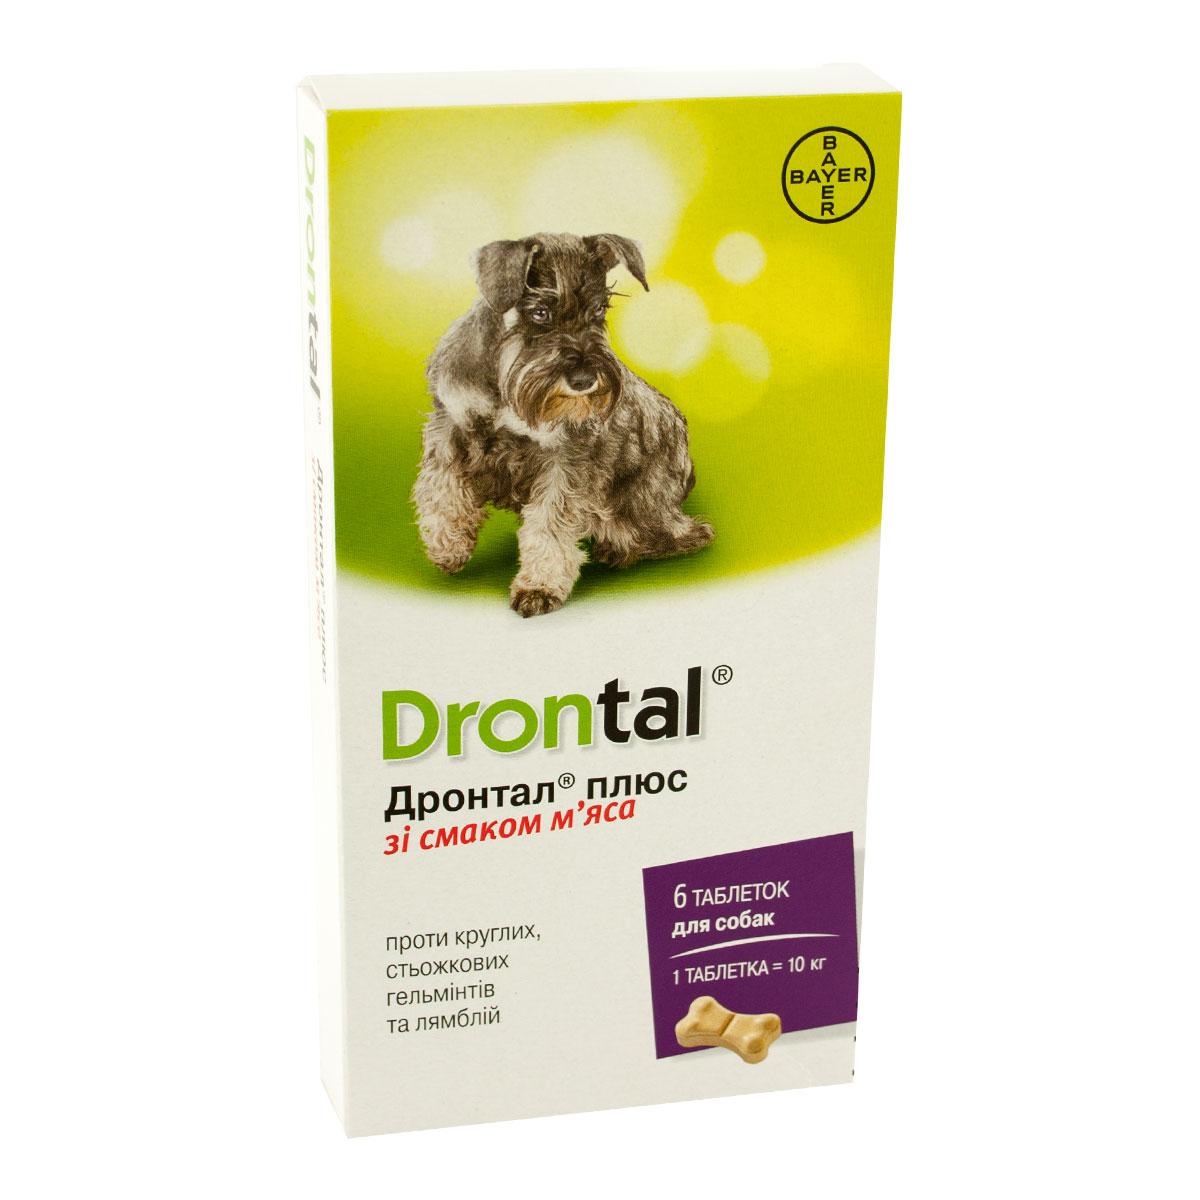 Антигельминтик для собак, Дронтал Баер